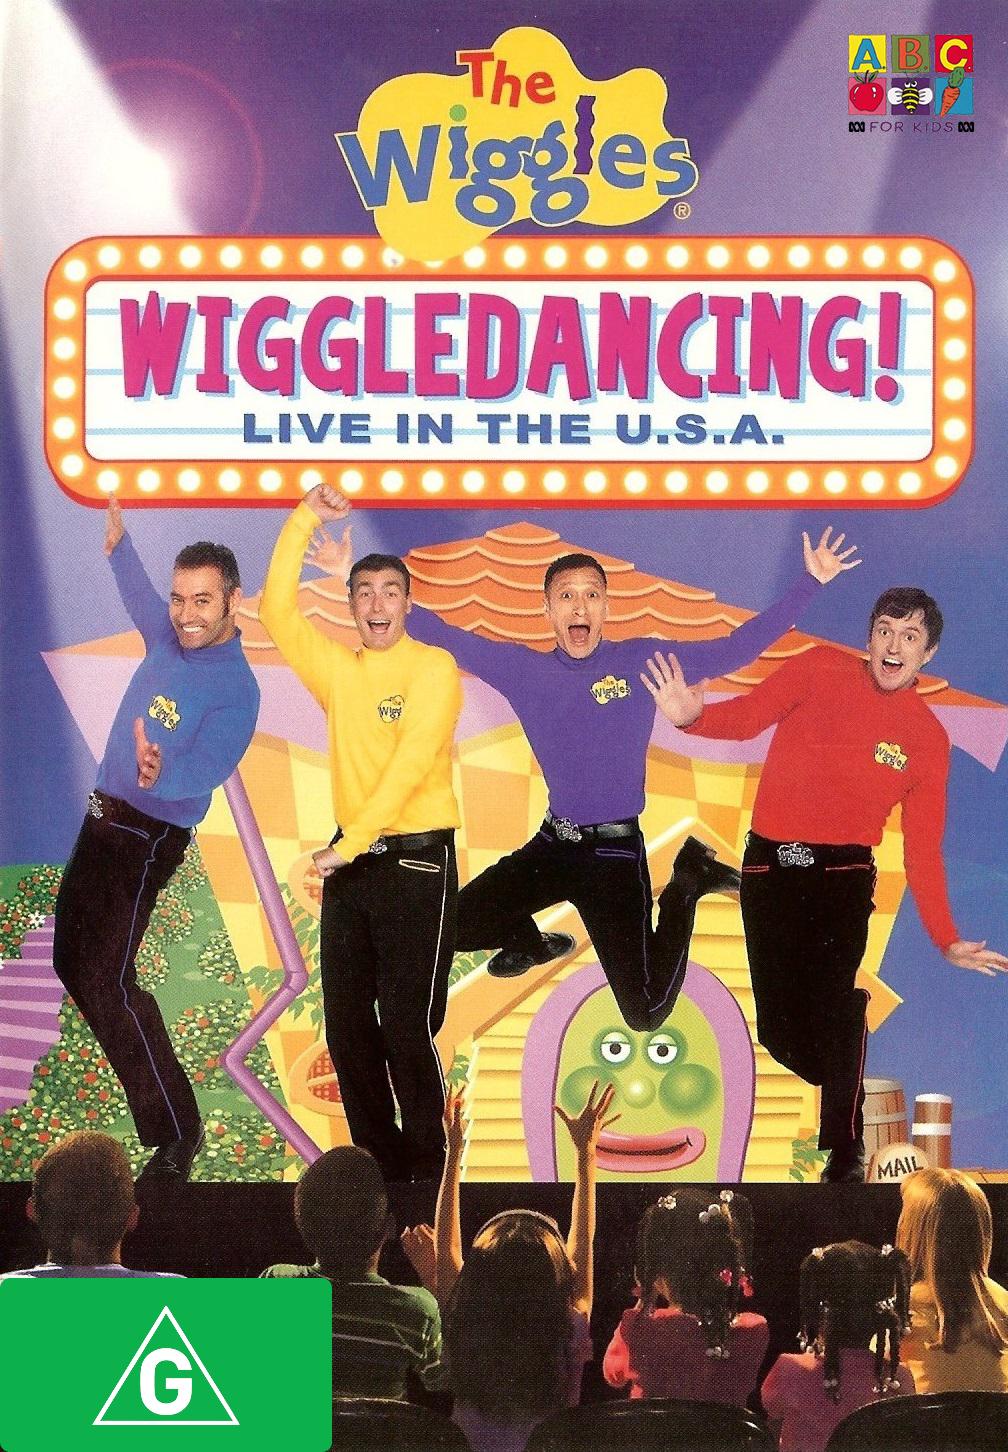 Wiggledancing! Live In The U.S.A.